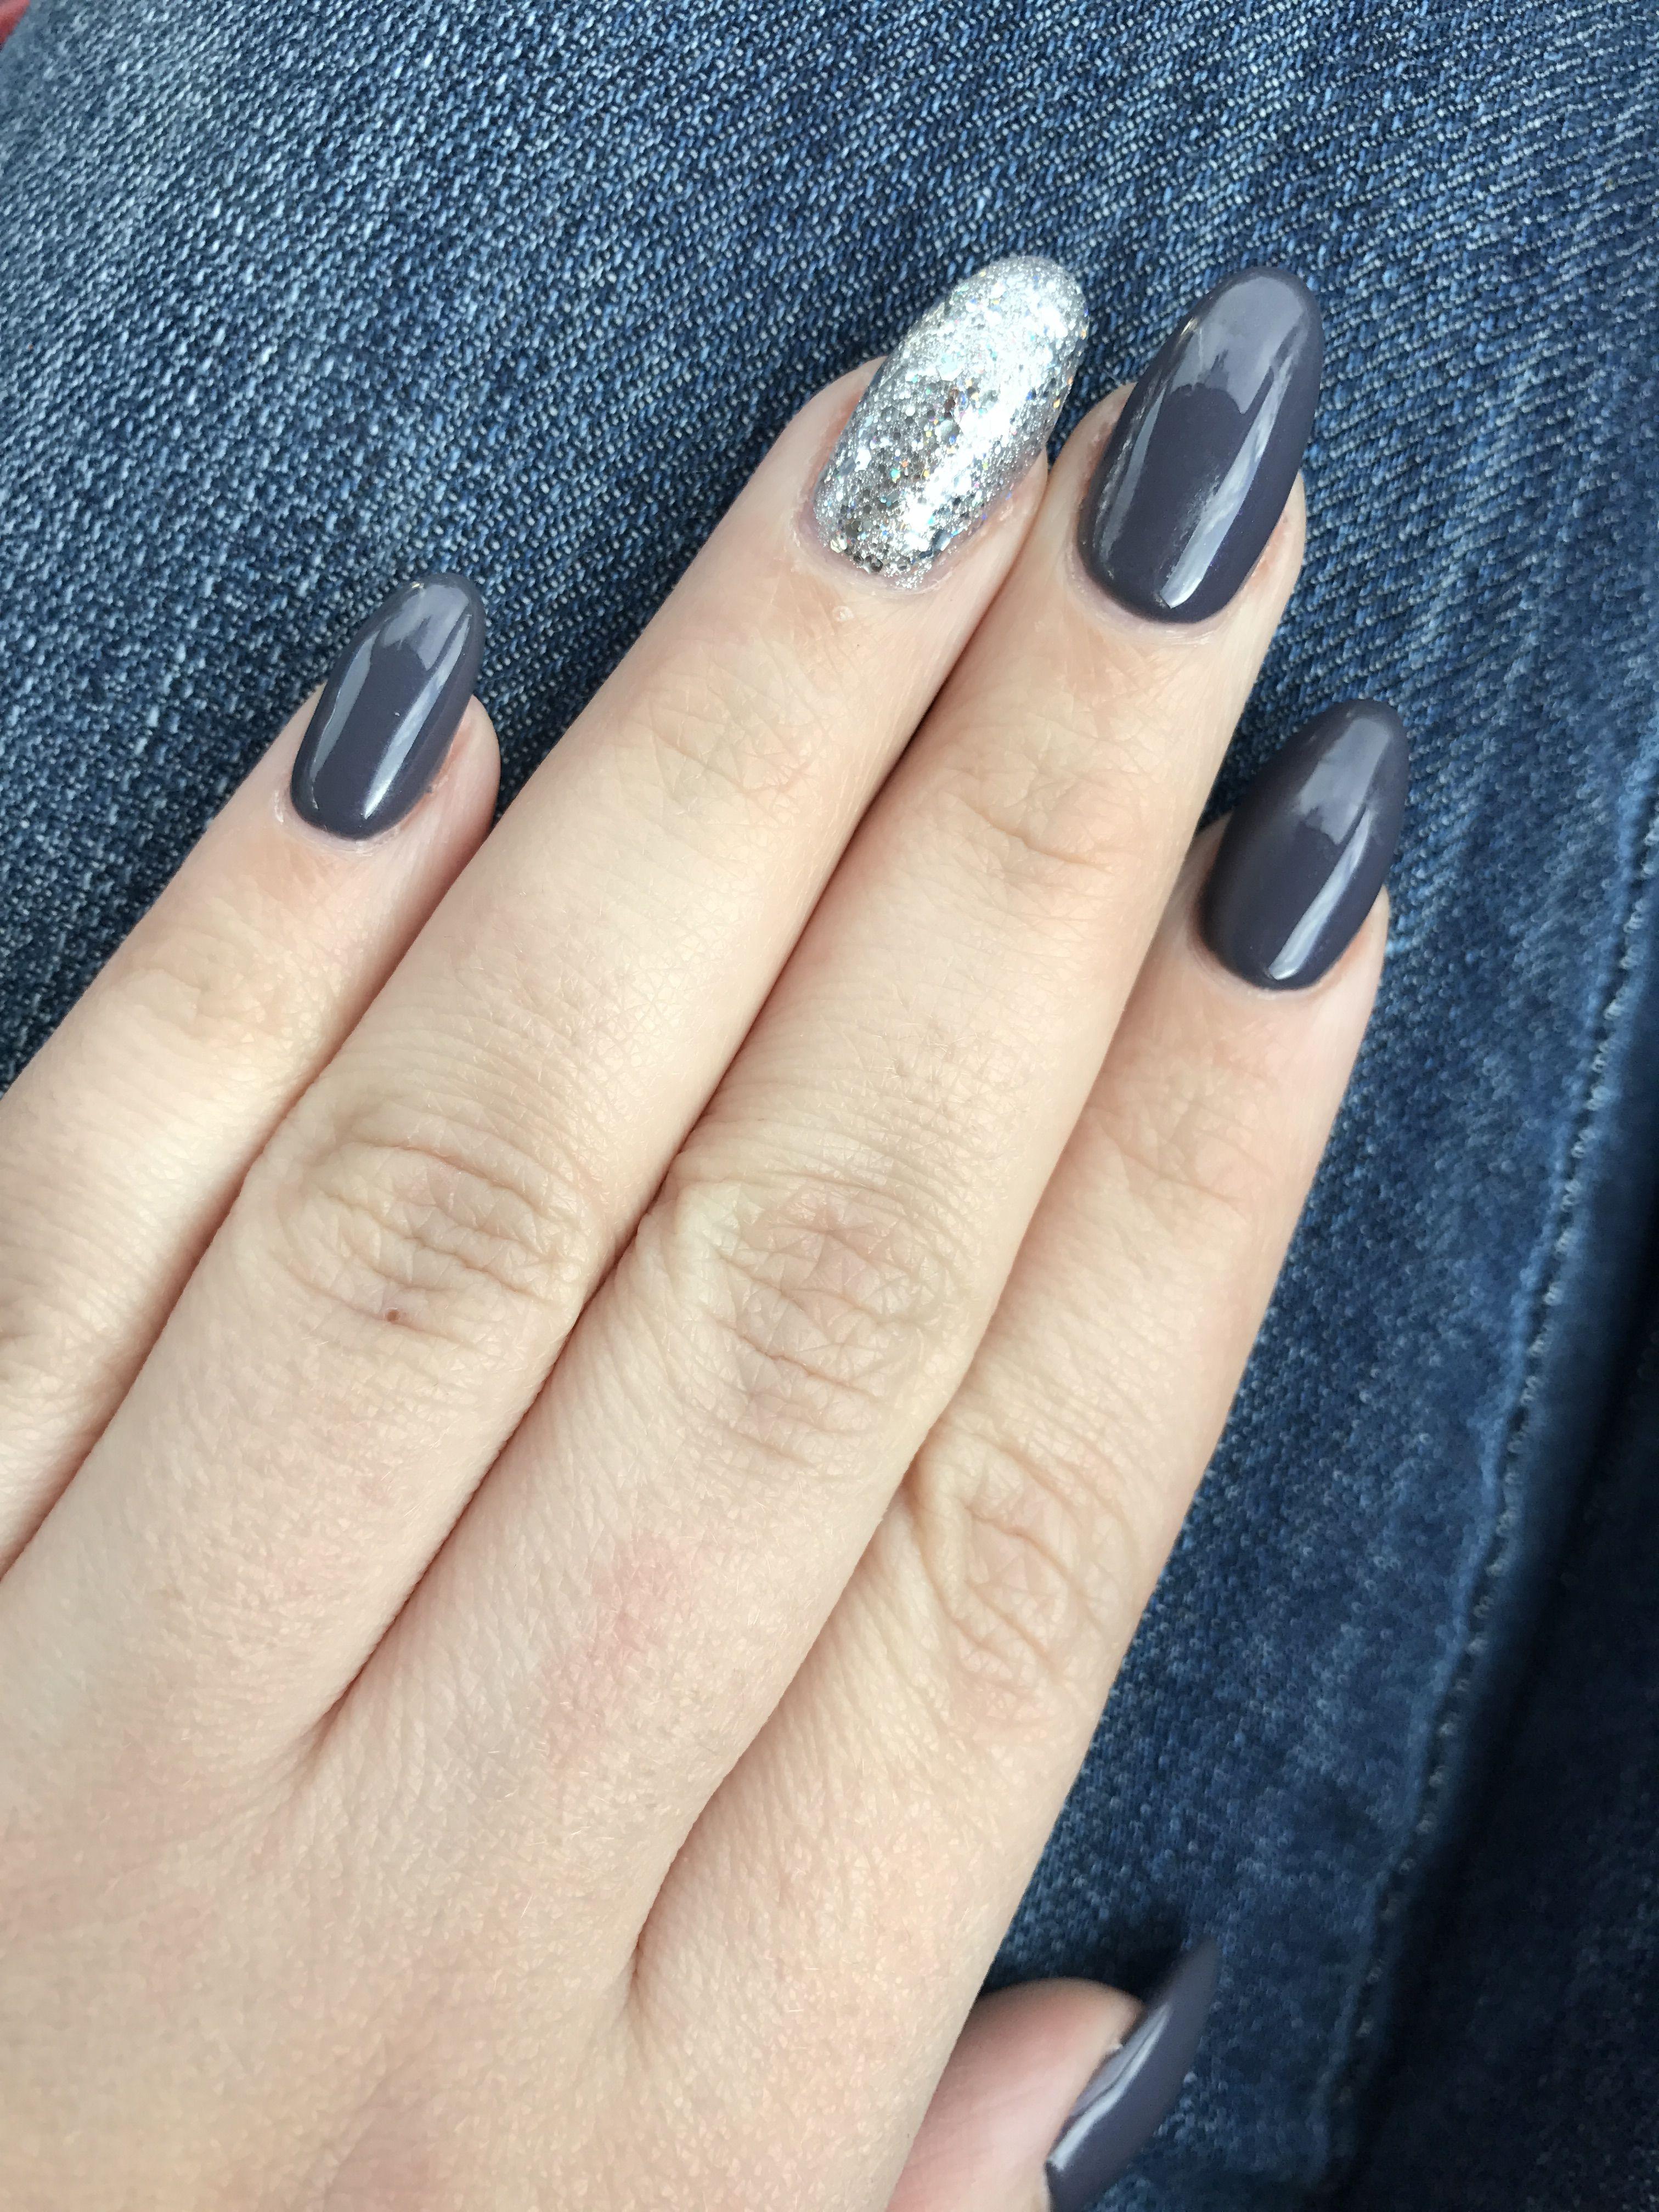 Grey Nail Arts: Dark Grey Round Nails With Glitter Accent